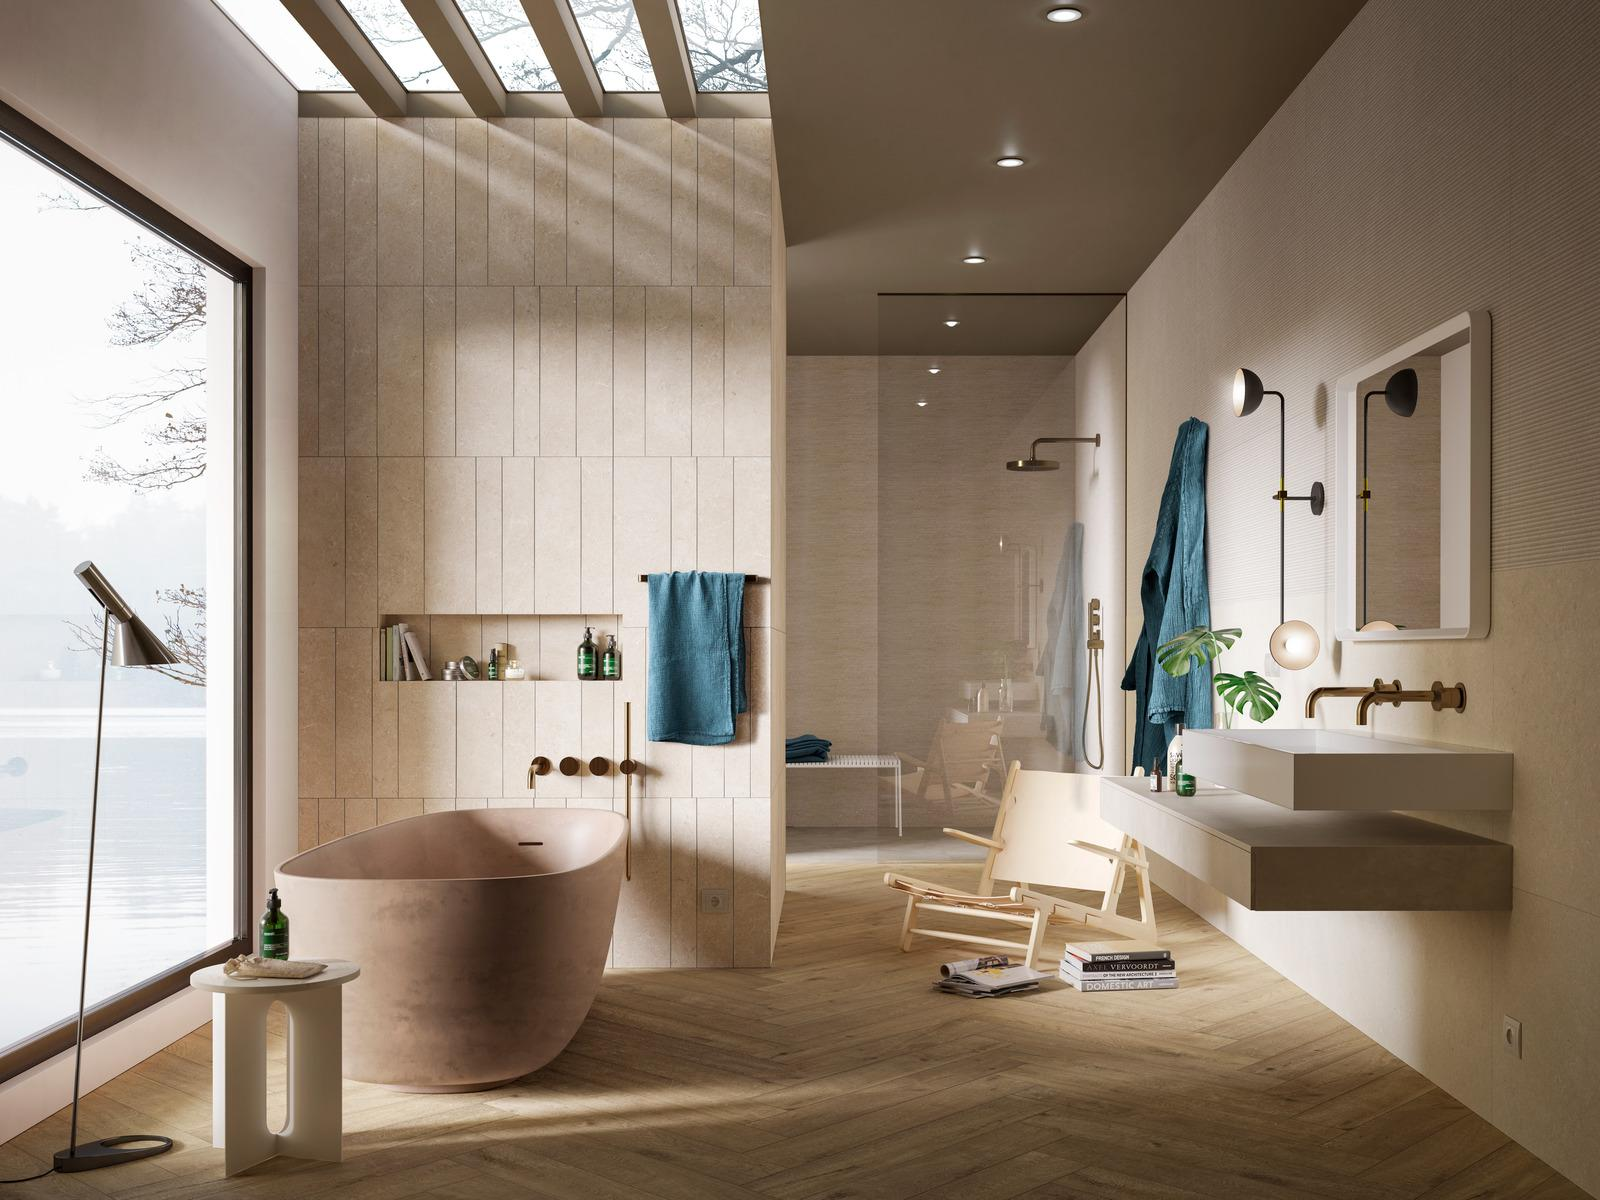 Marazzi - naturalna i elegancka łazienka